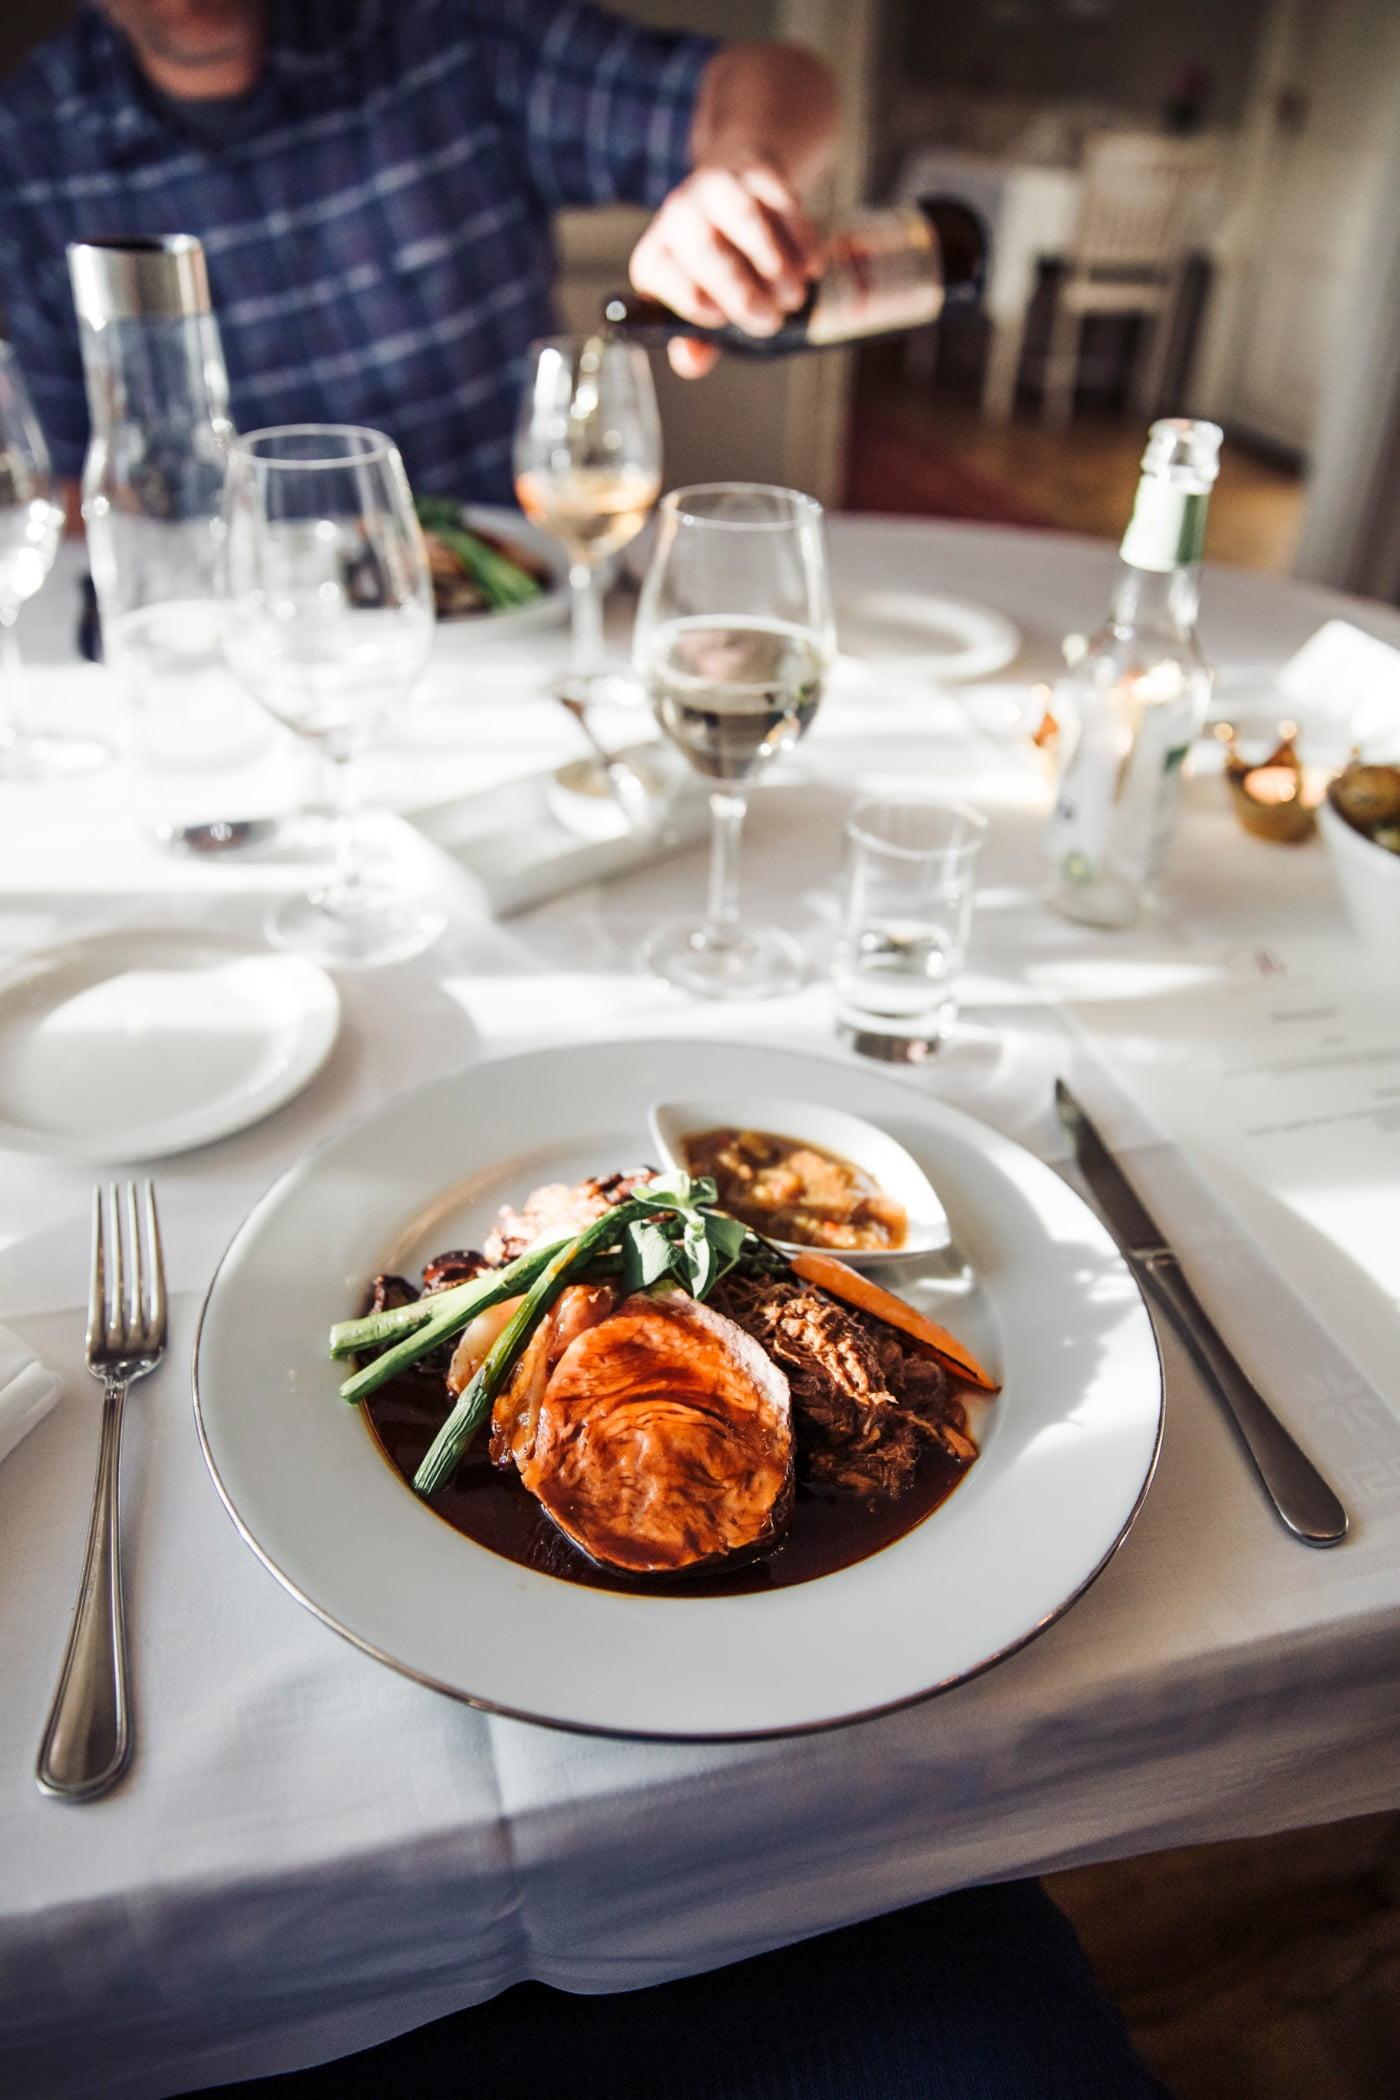 Wine glass, Food, Table, Tableware, Furniture, Dishware, Fork, Plate, Ingredient, Recipe